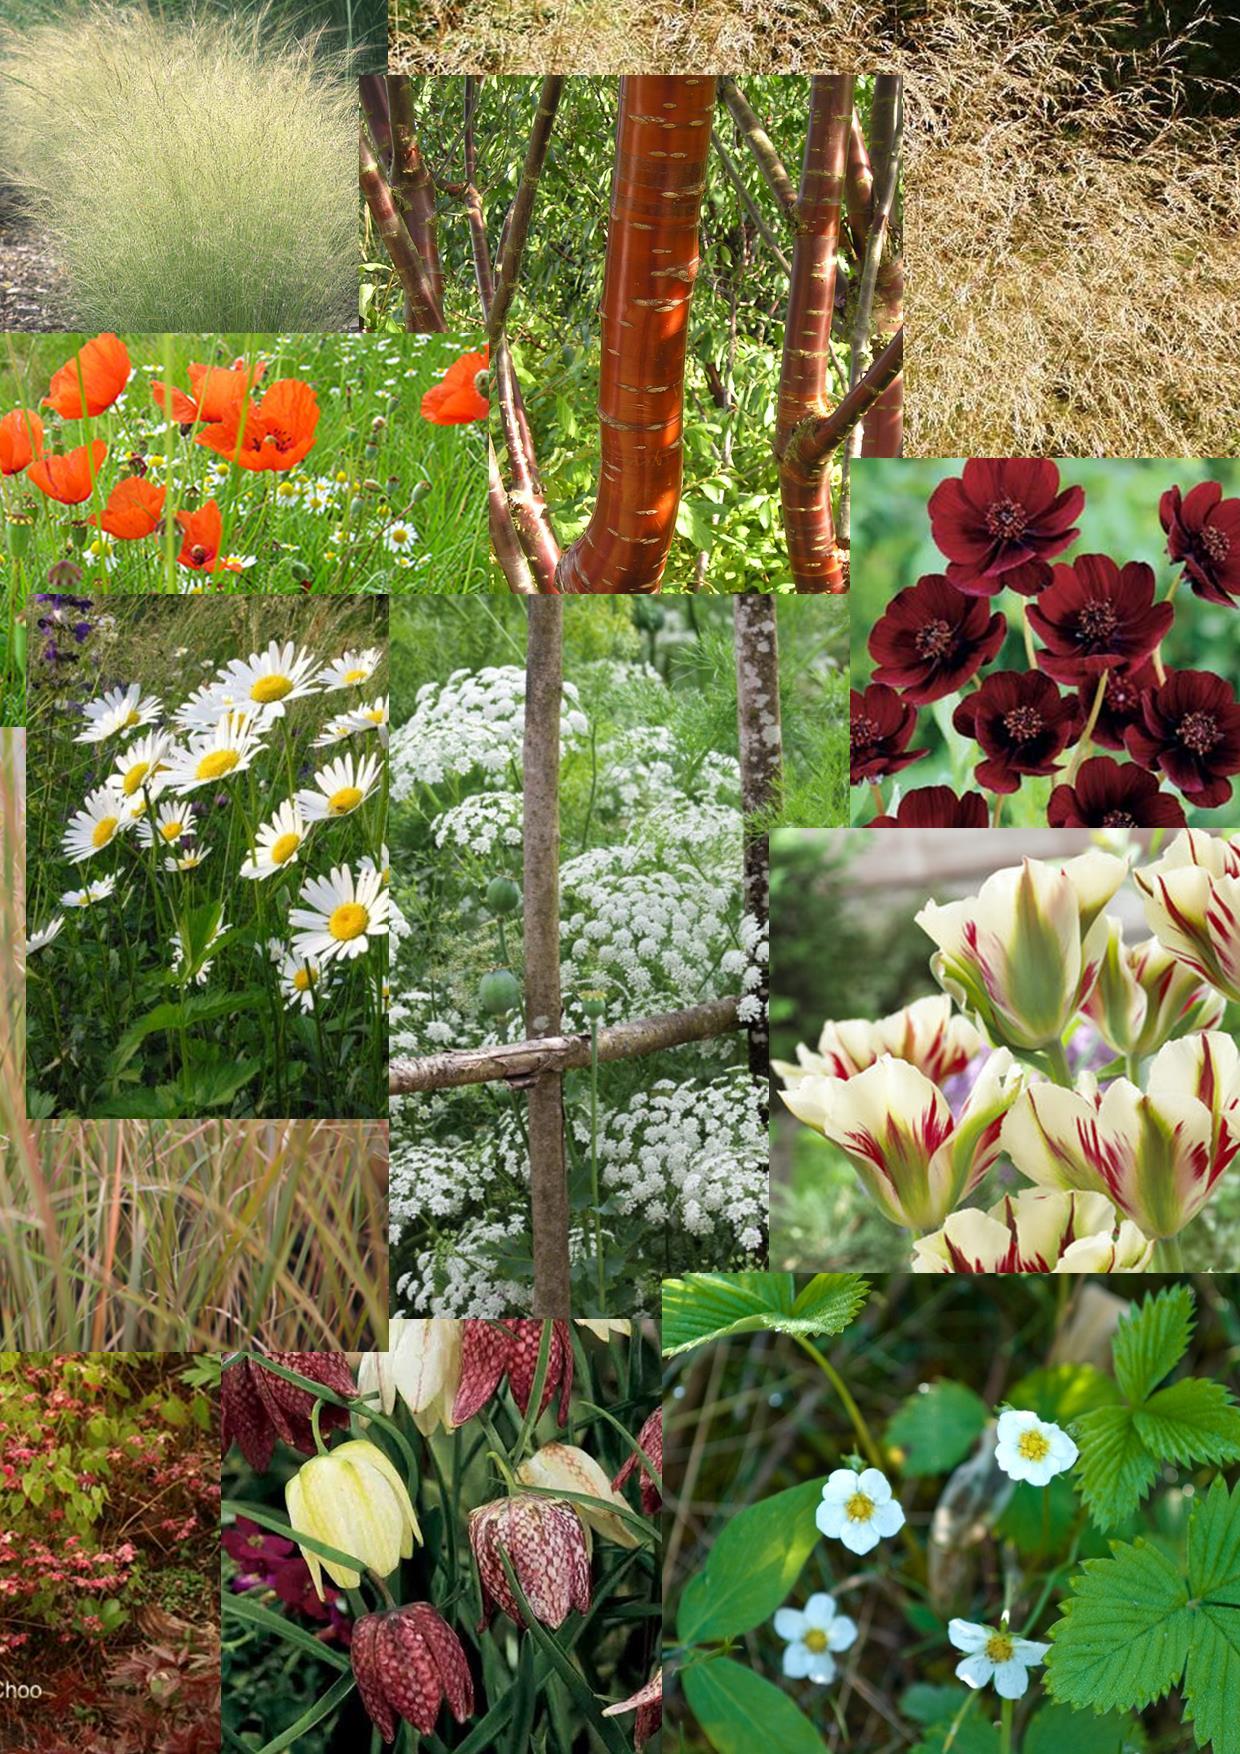 Big news get ready rhs malvern spring festival 15 for Redesign my garden